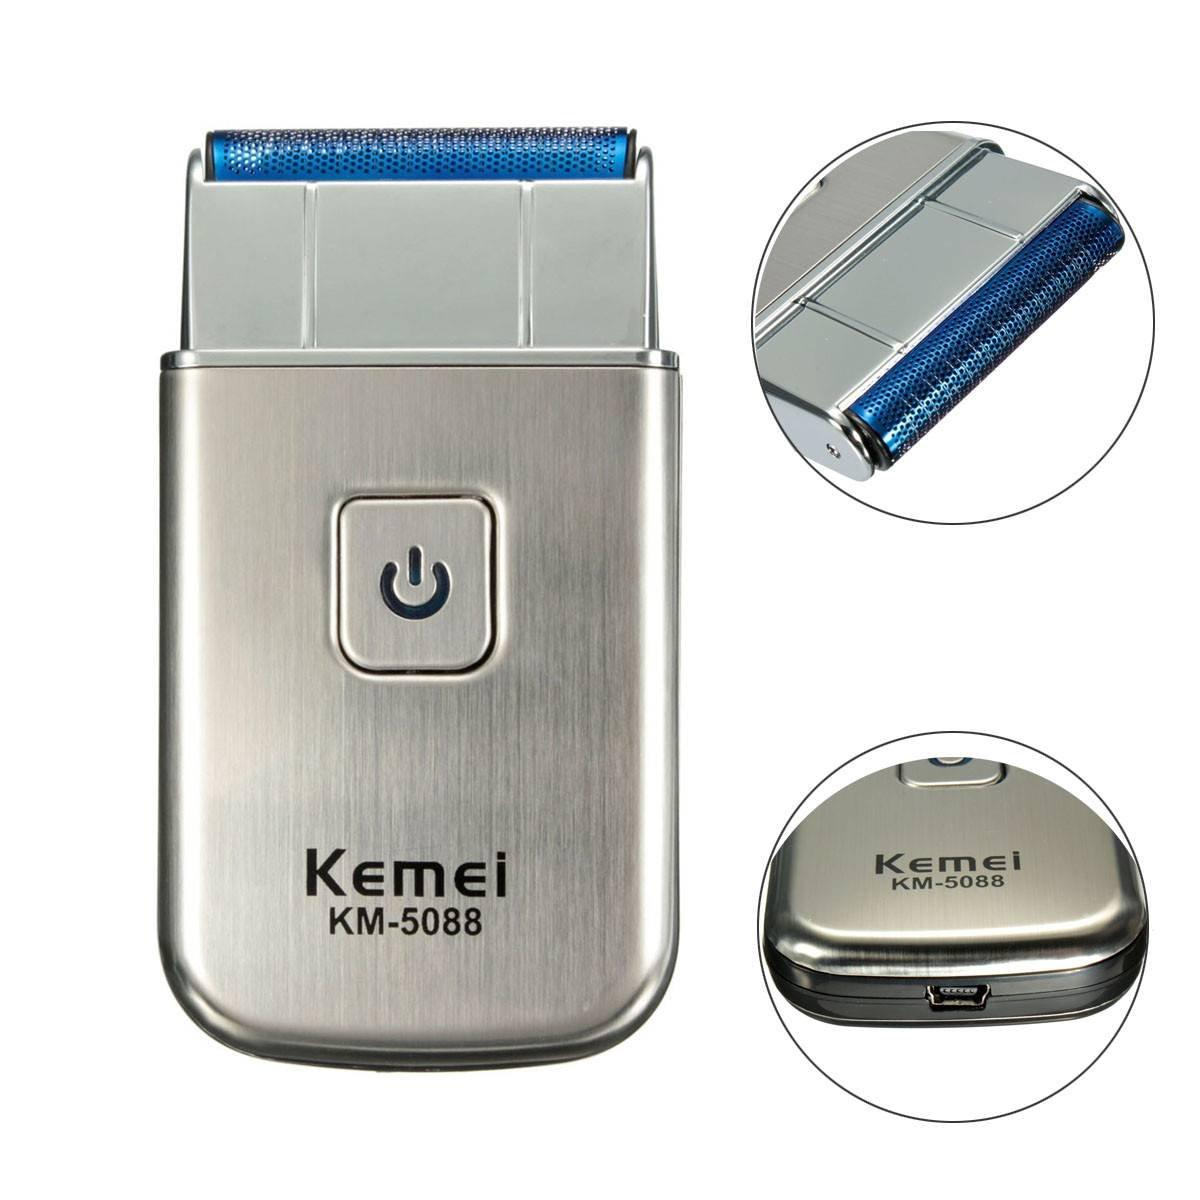 Electric shaver LuckyFine Men's Pocket USB Rechargeable Electric Foil Shaver Beard Razor For Travel AHGRD005735